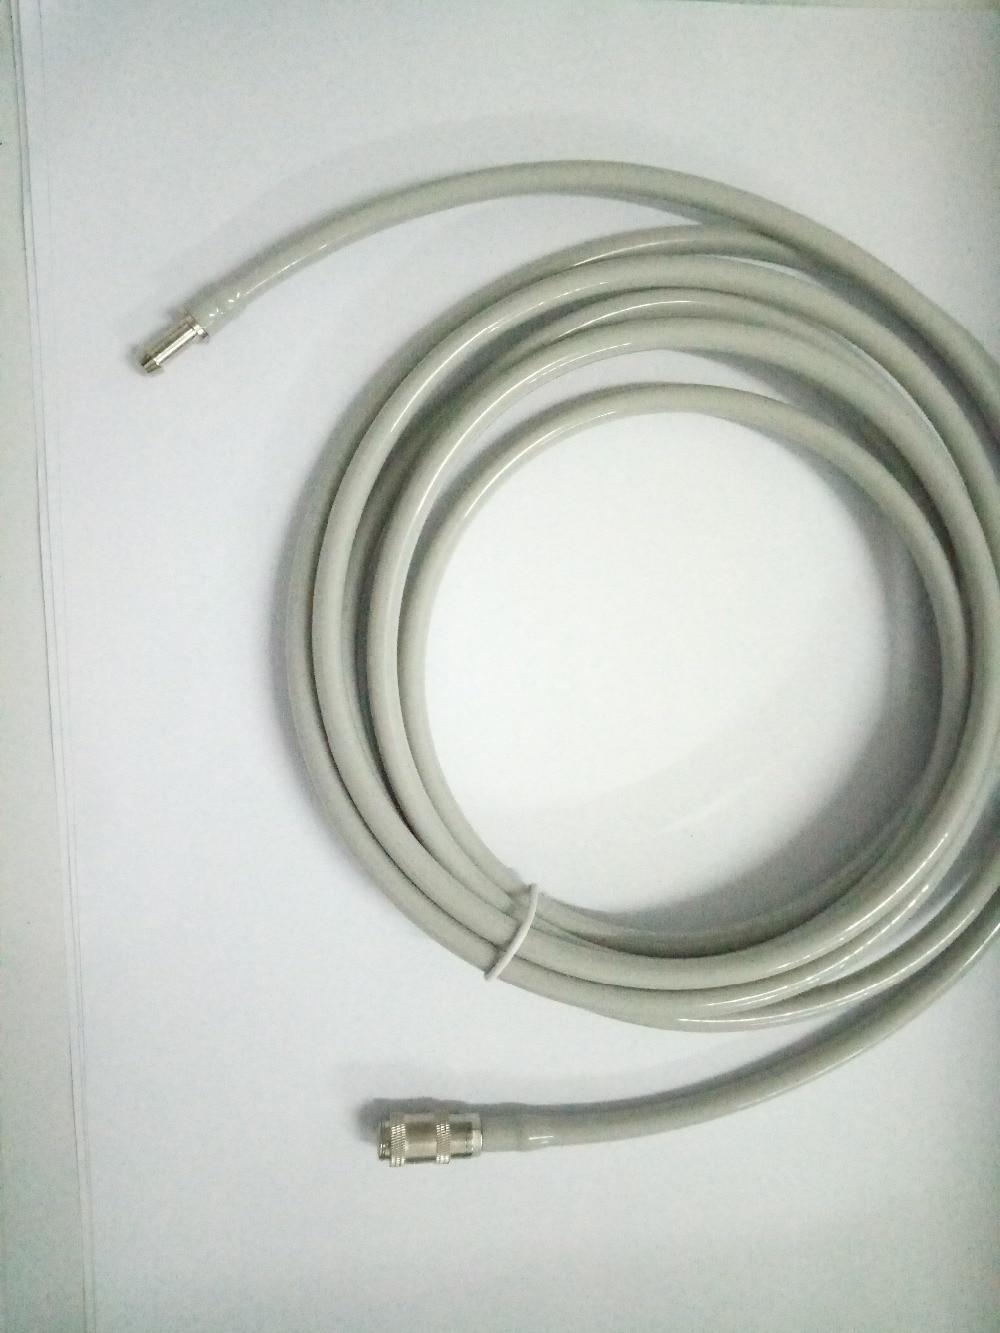 kmtkeramed Pressure Cuff Interconnect Tubing, Single tube, 10 ft 3.0 M, Bayonet type > Bayonet type,Giving free connector